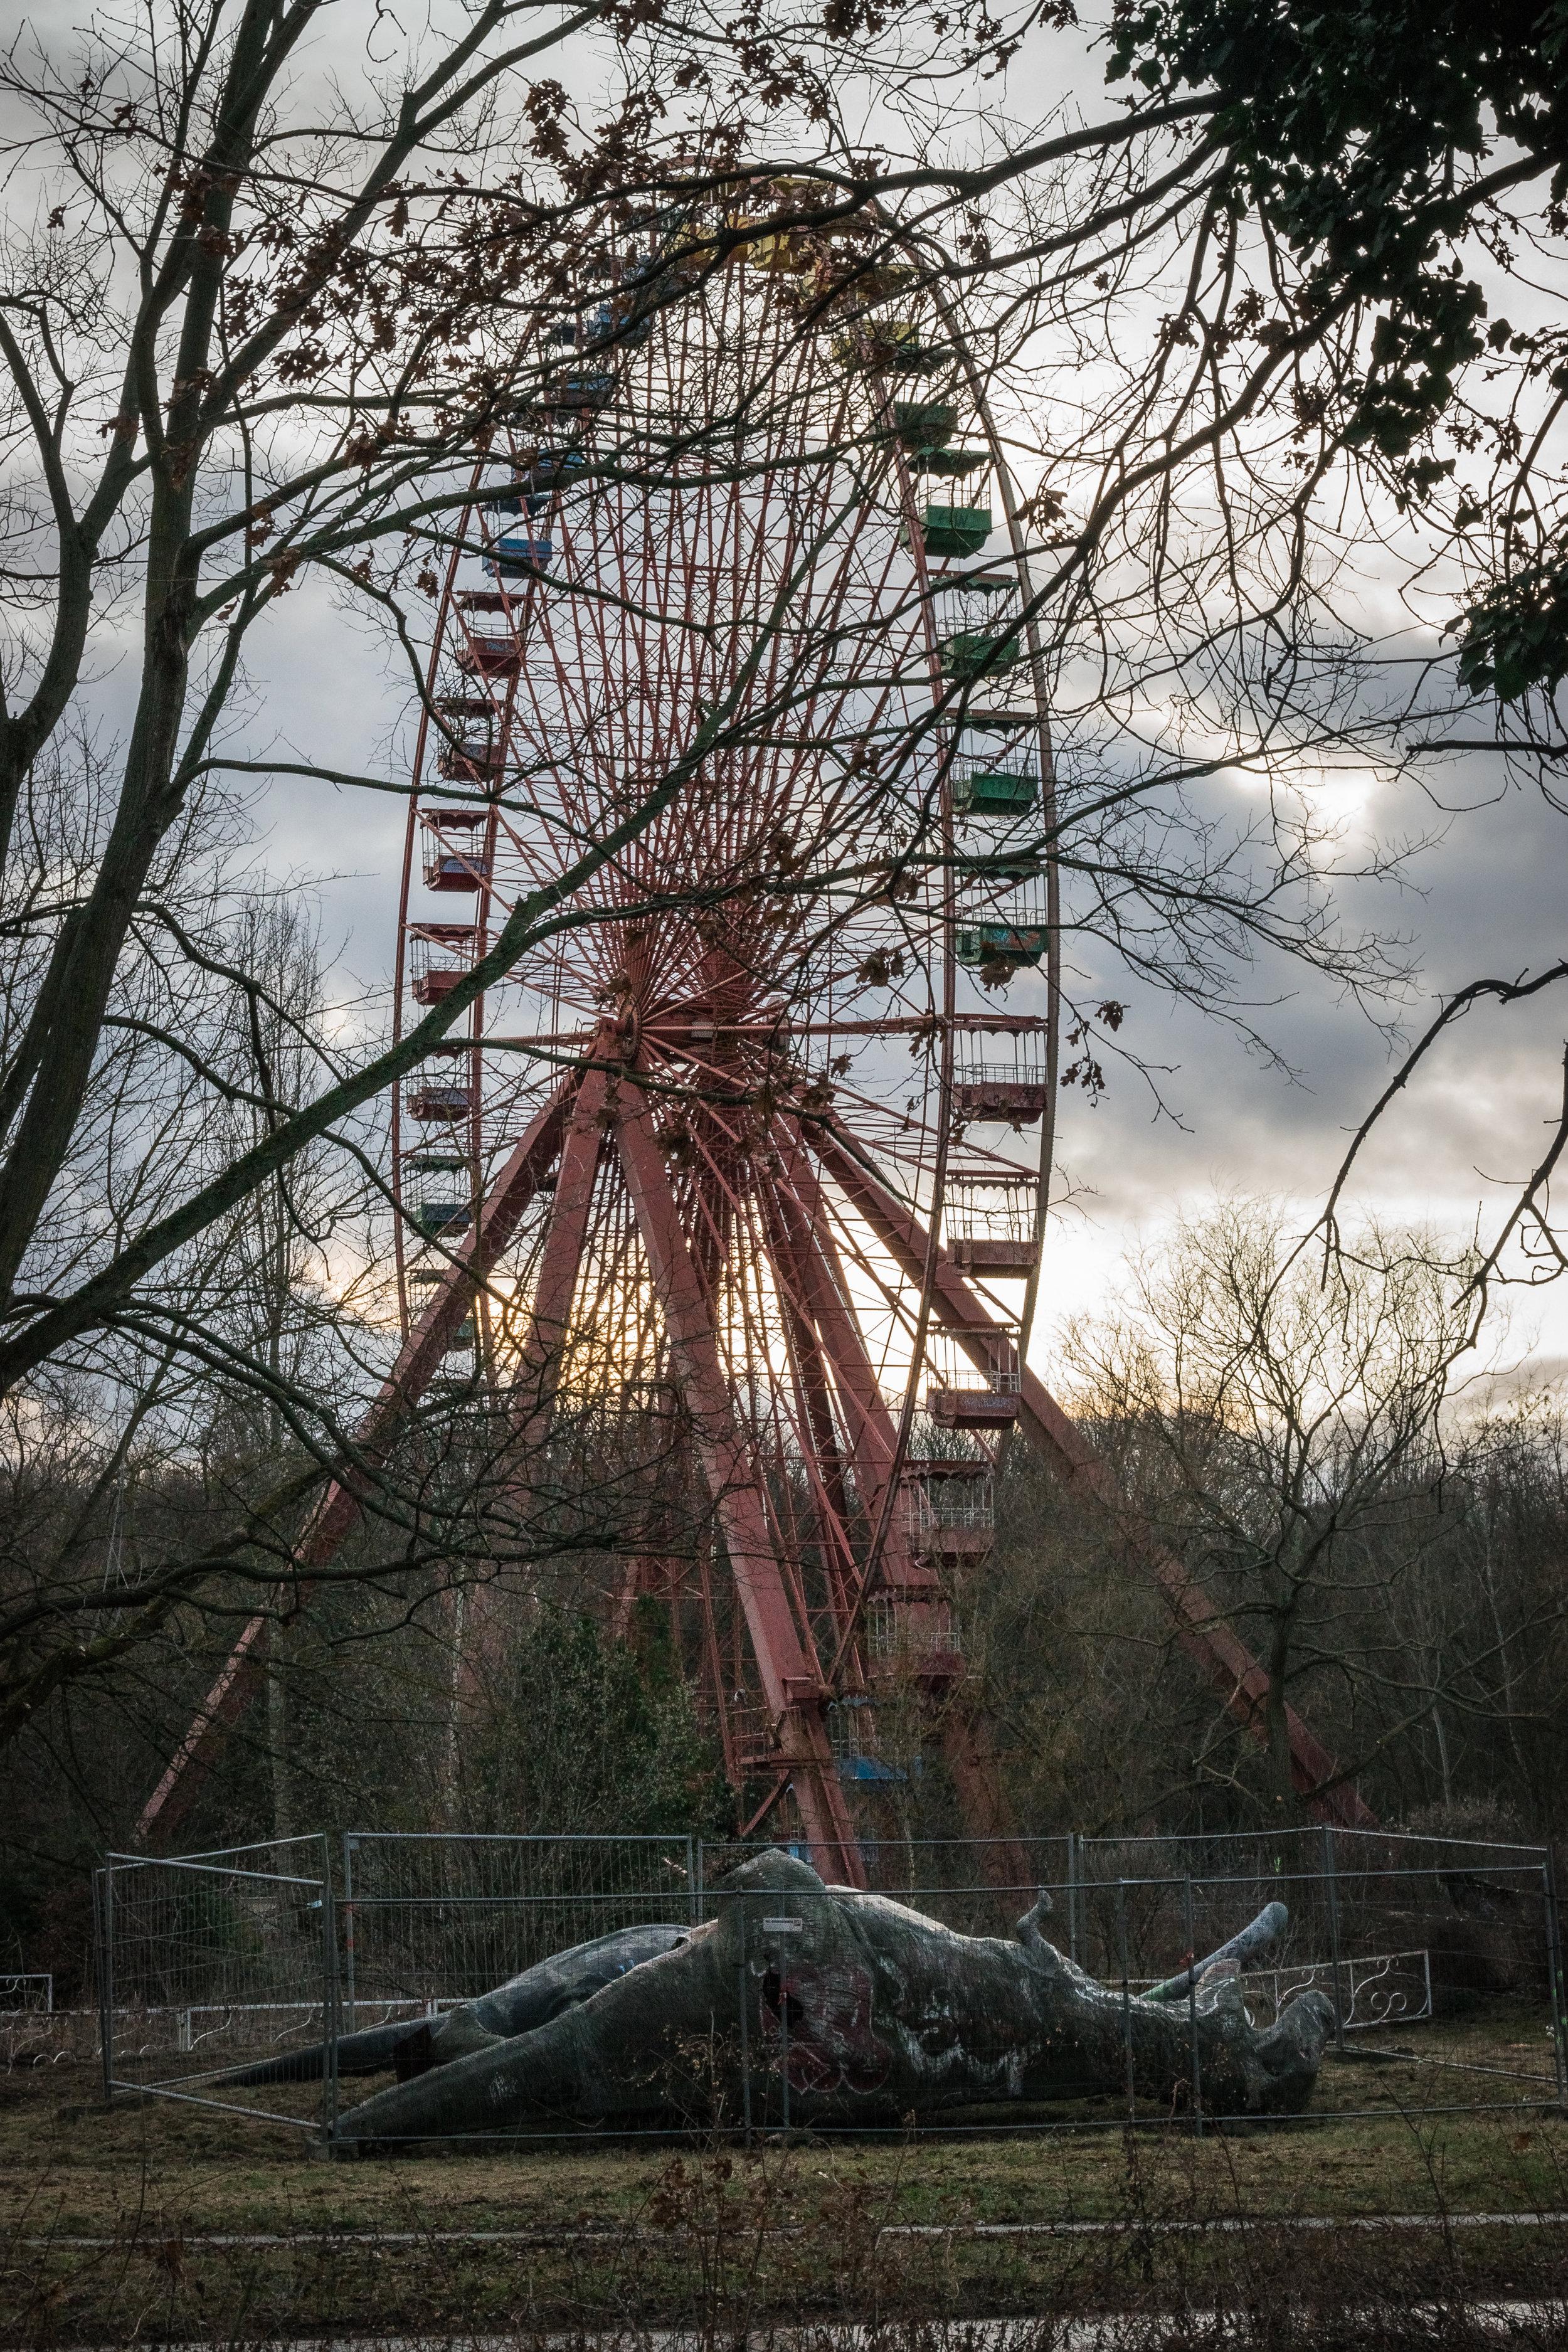 a tragedy of dinosaur & Ferris wheel proportions